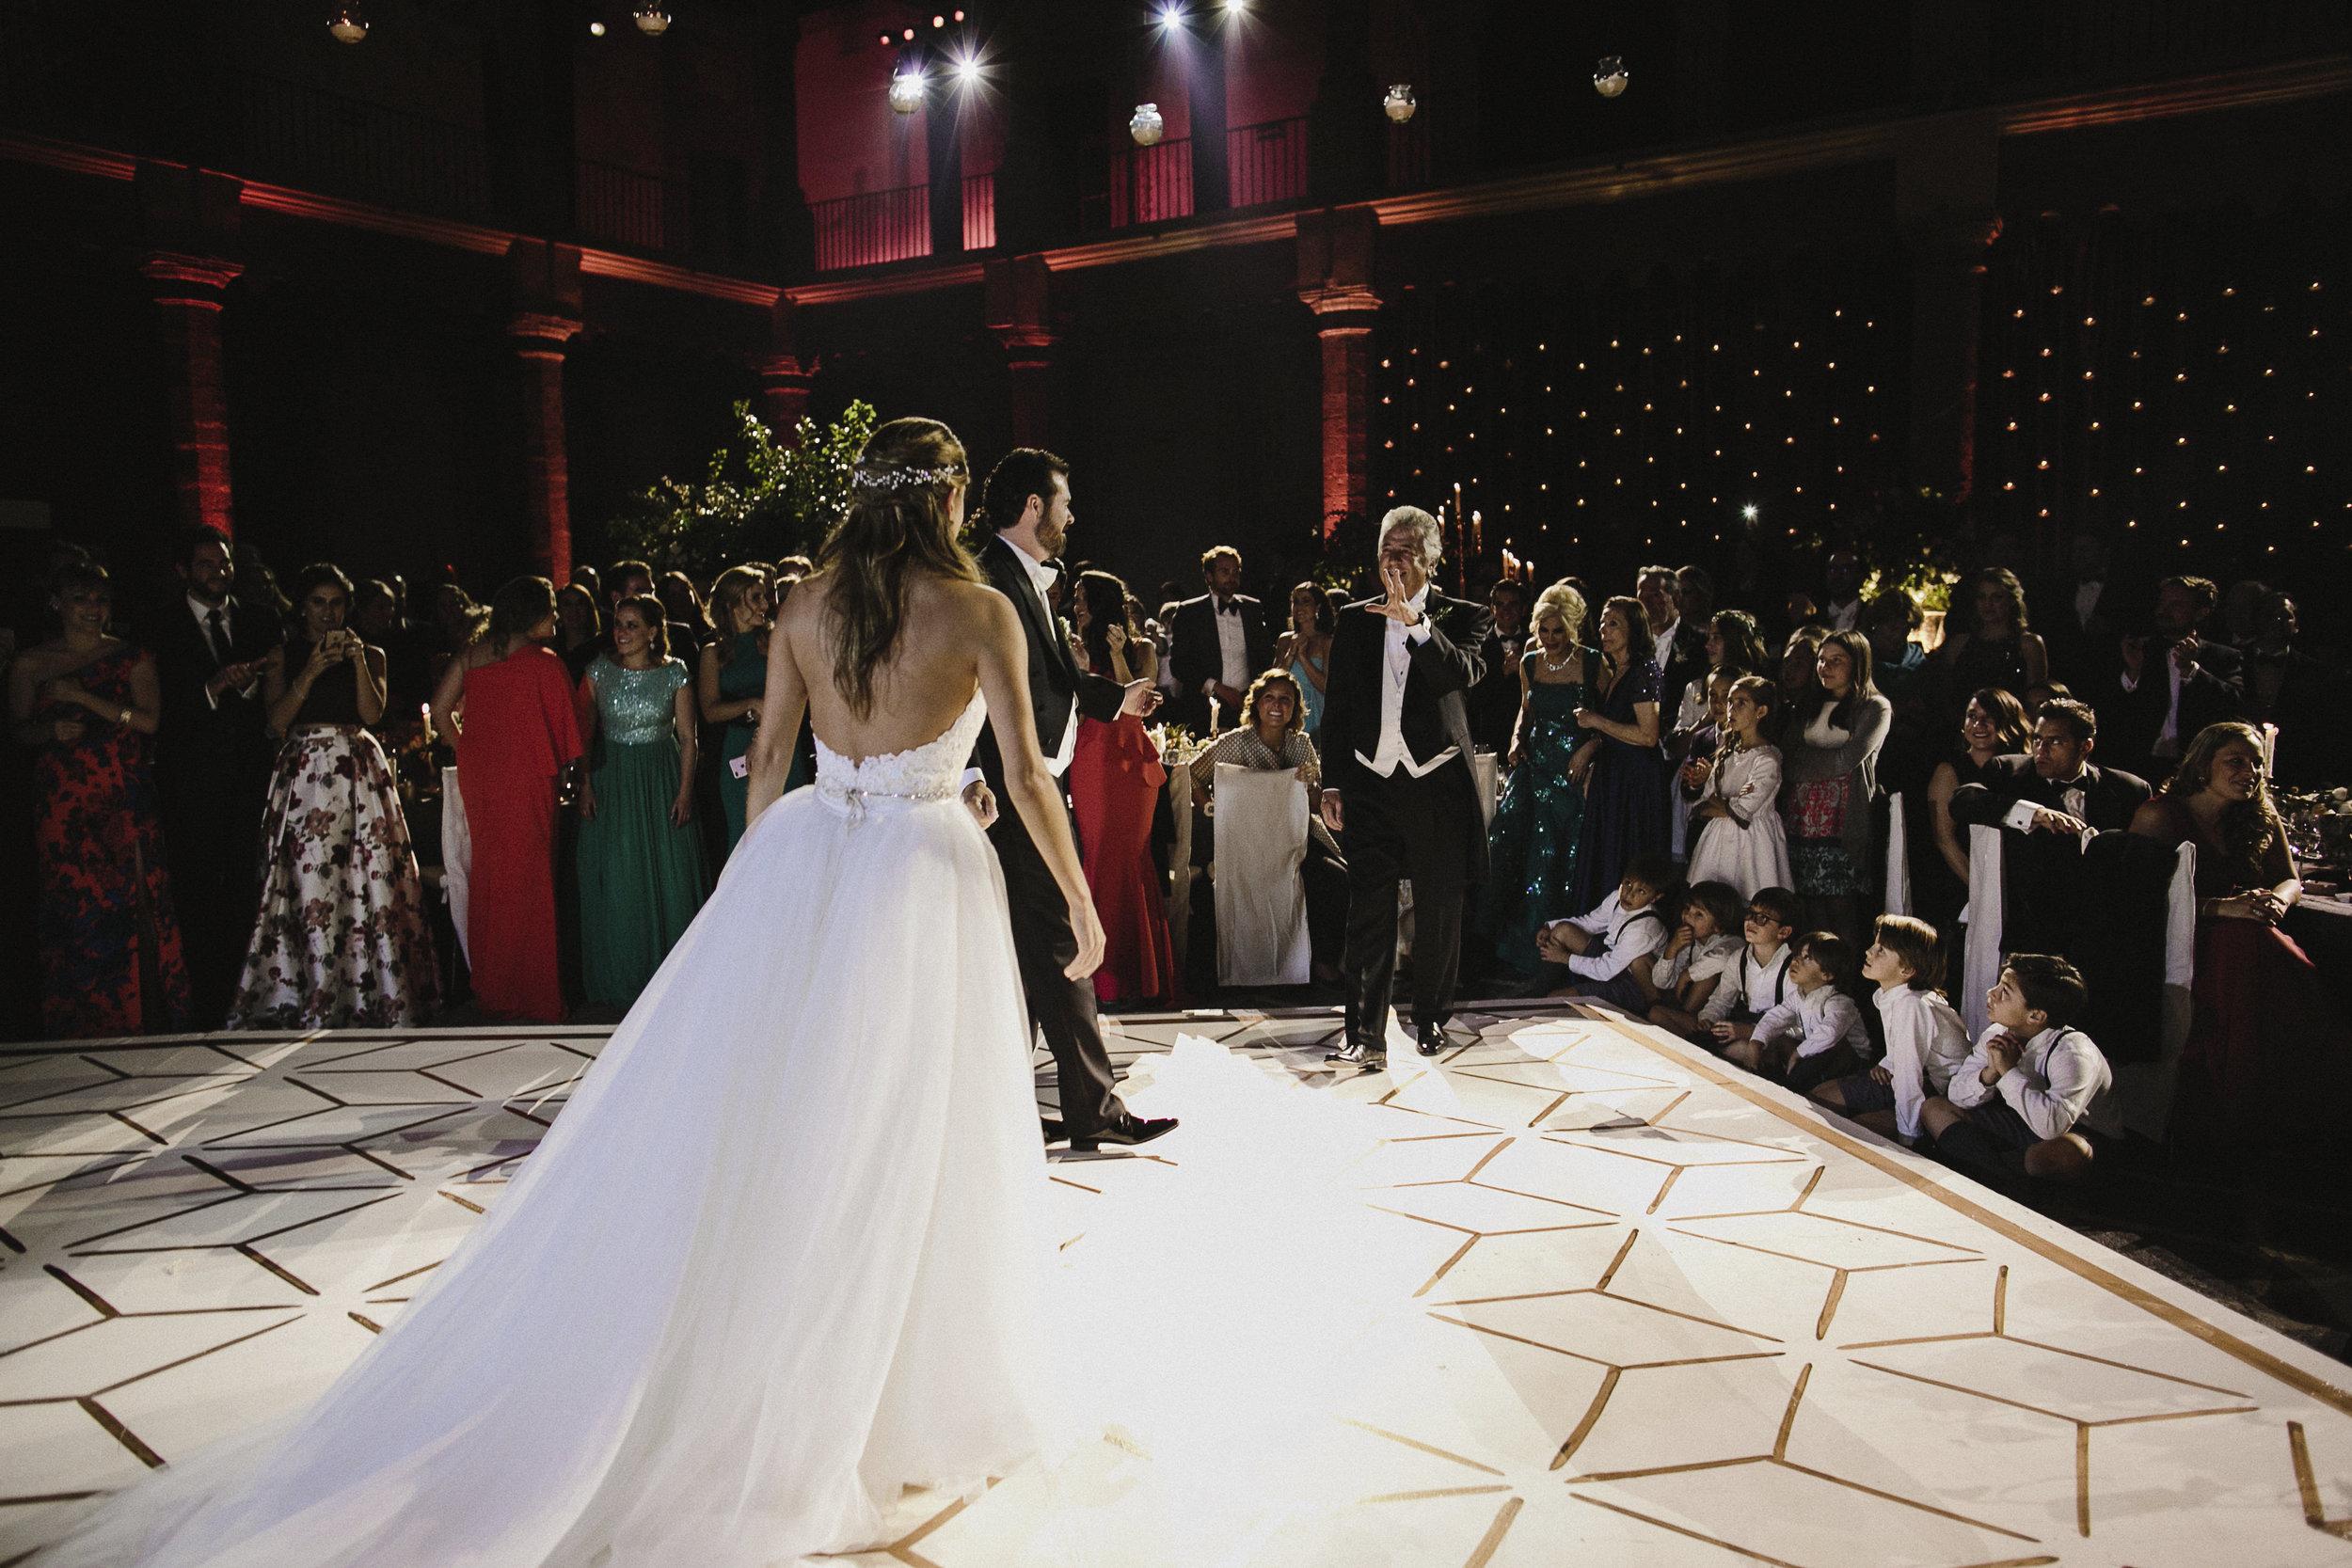 alfonso_flores_destination_wedding_photogrpahy_paola_alonso-988.JPG